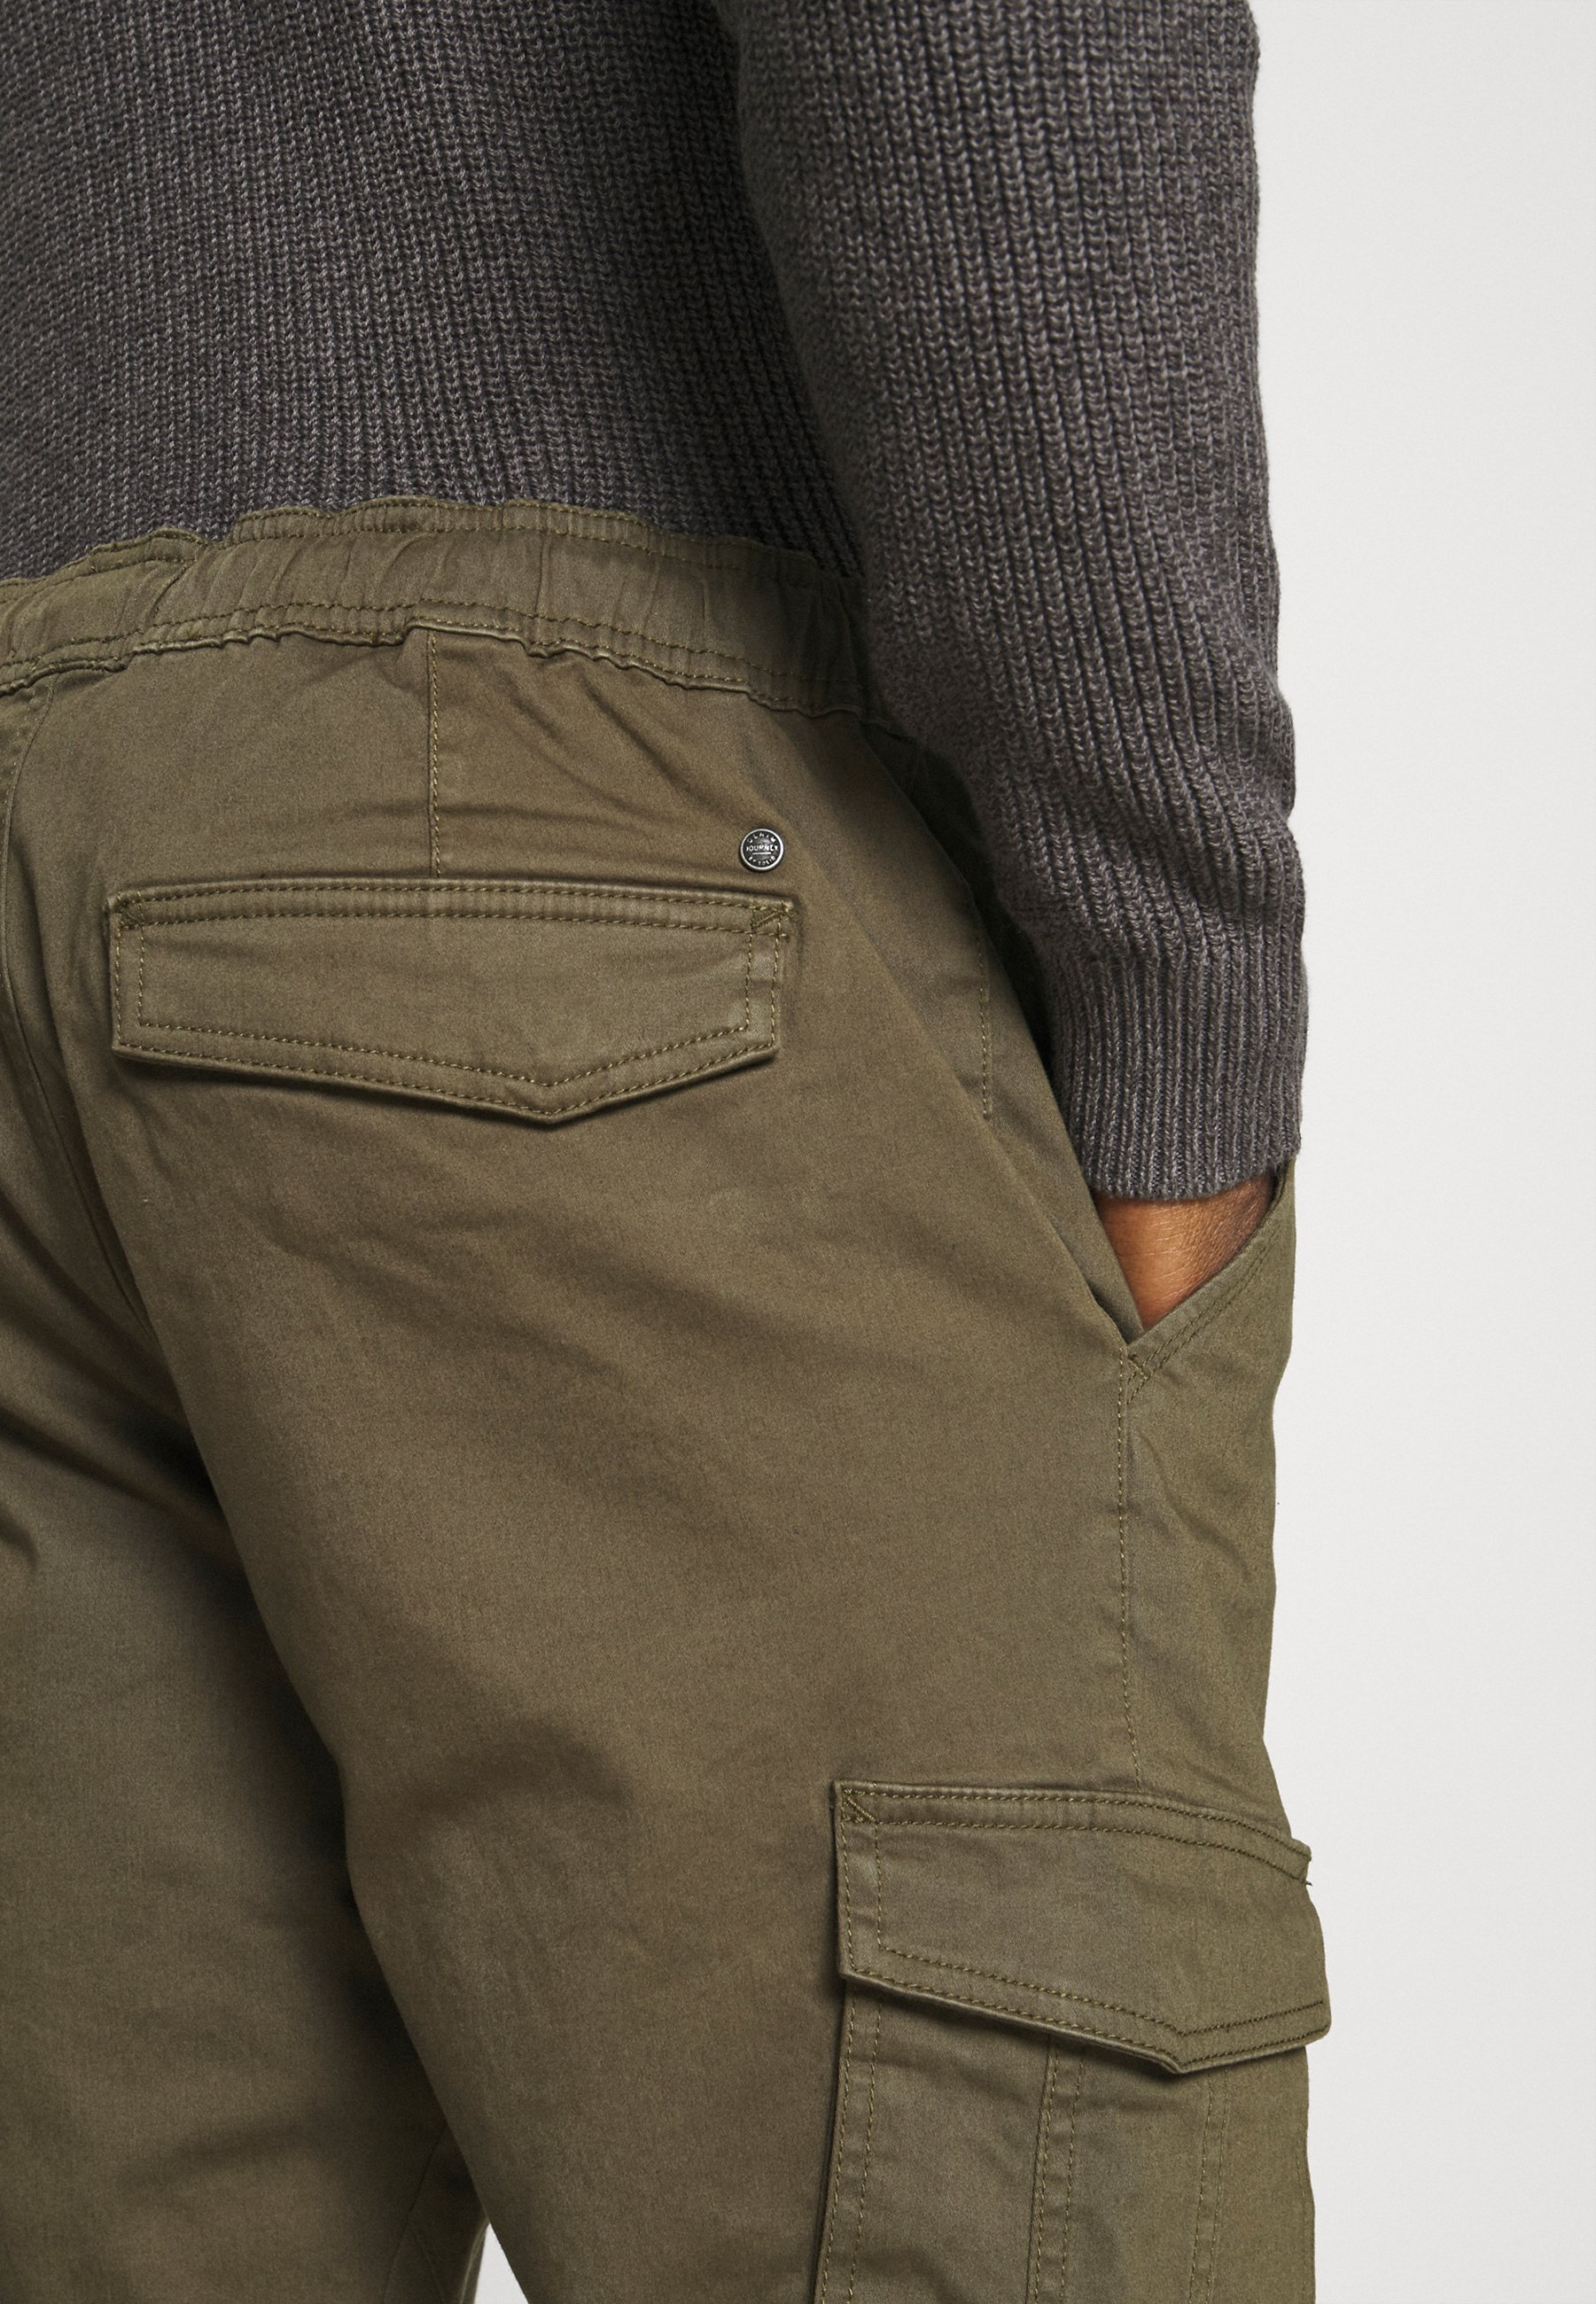 Homme JIM CUFF - Pantalon cargo